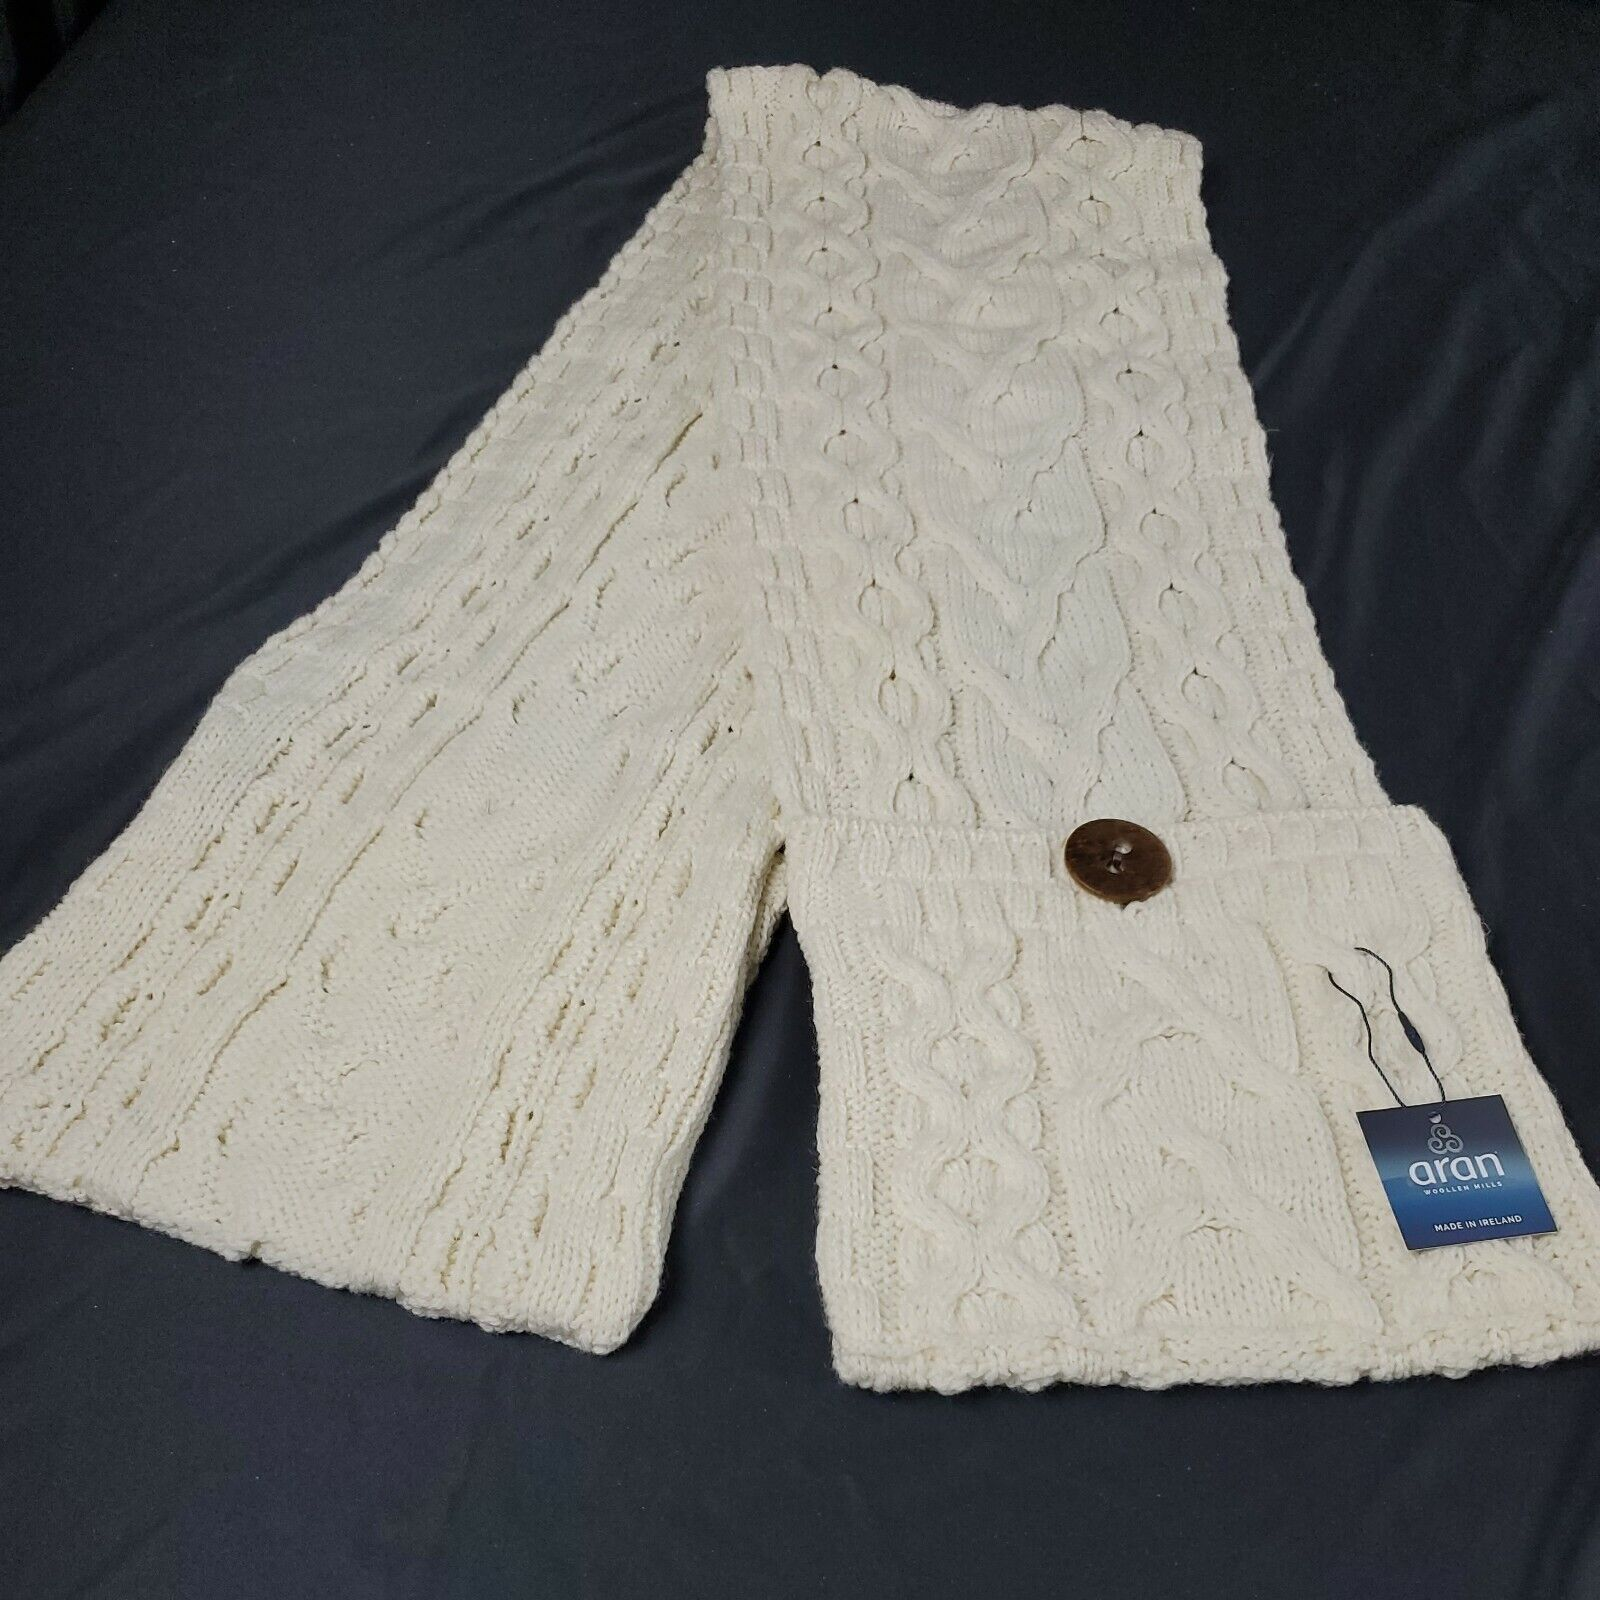 Aran Woolen Mills Ivory Cream Cable knit Scarf Button Pockets Irish Winter Wool